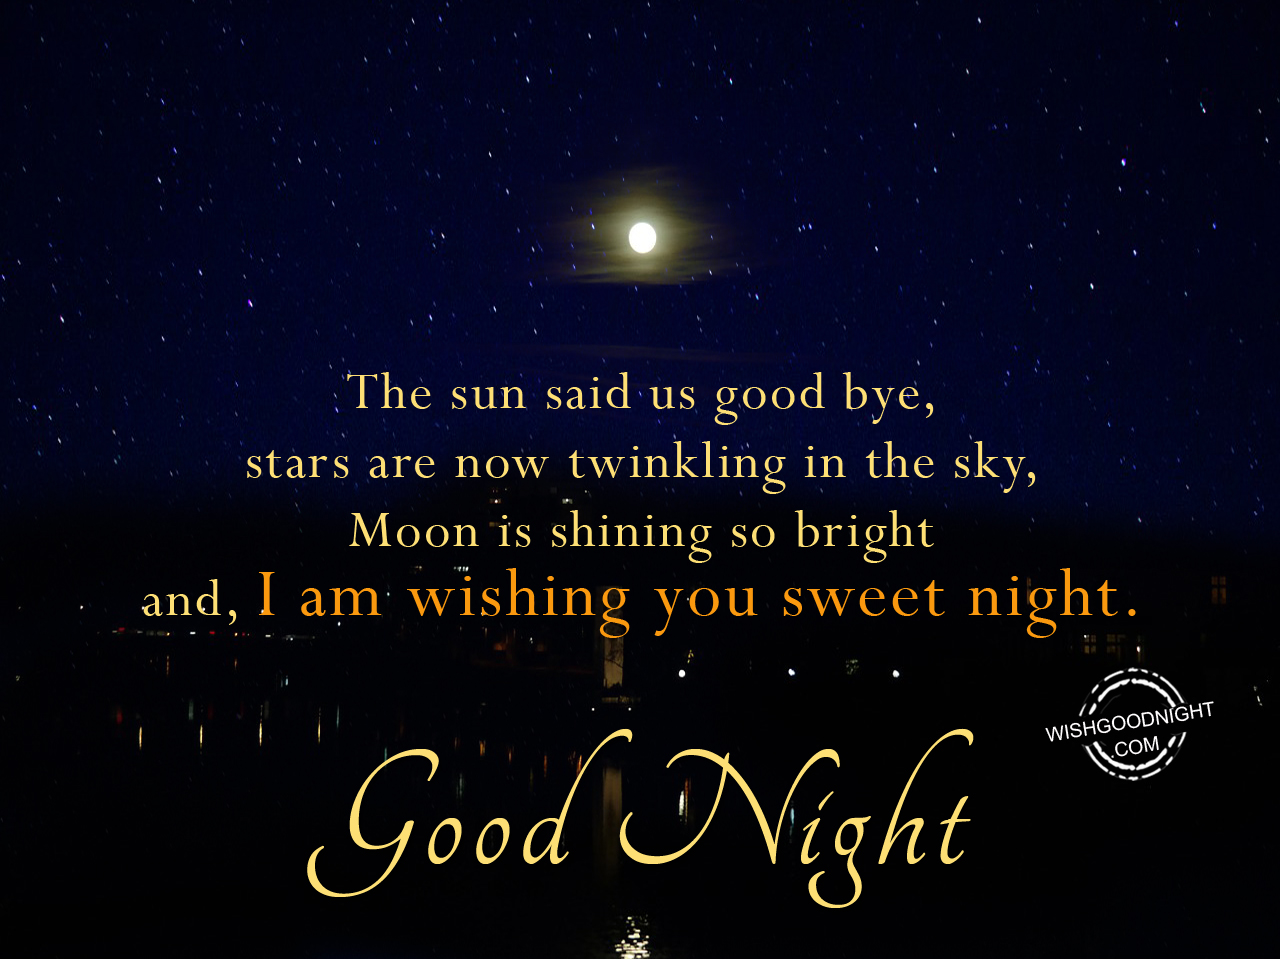 Good Night Wishes - Good Night Pictures - WishGoodNight.com